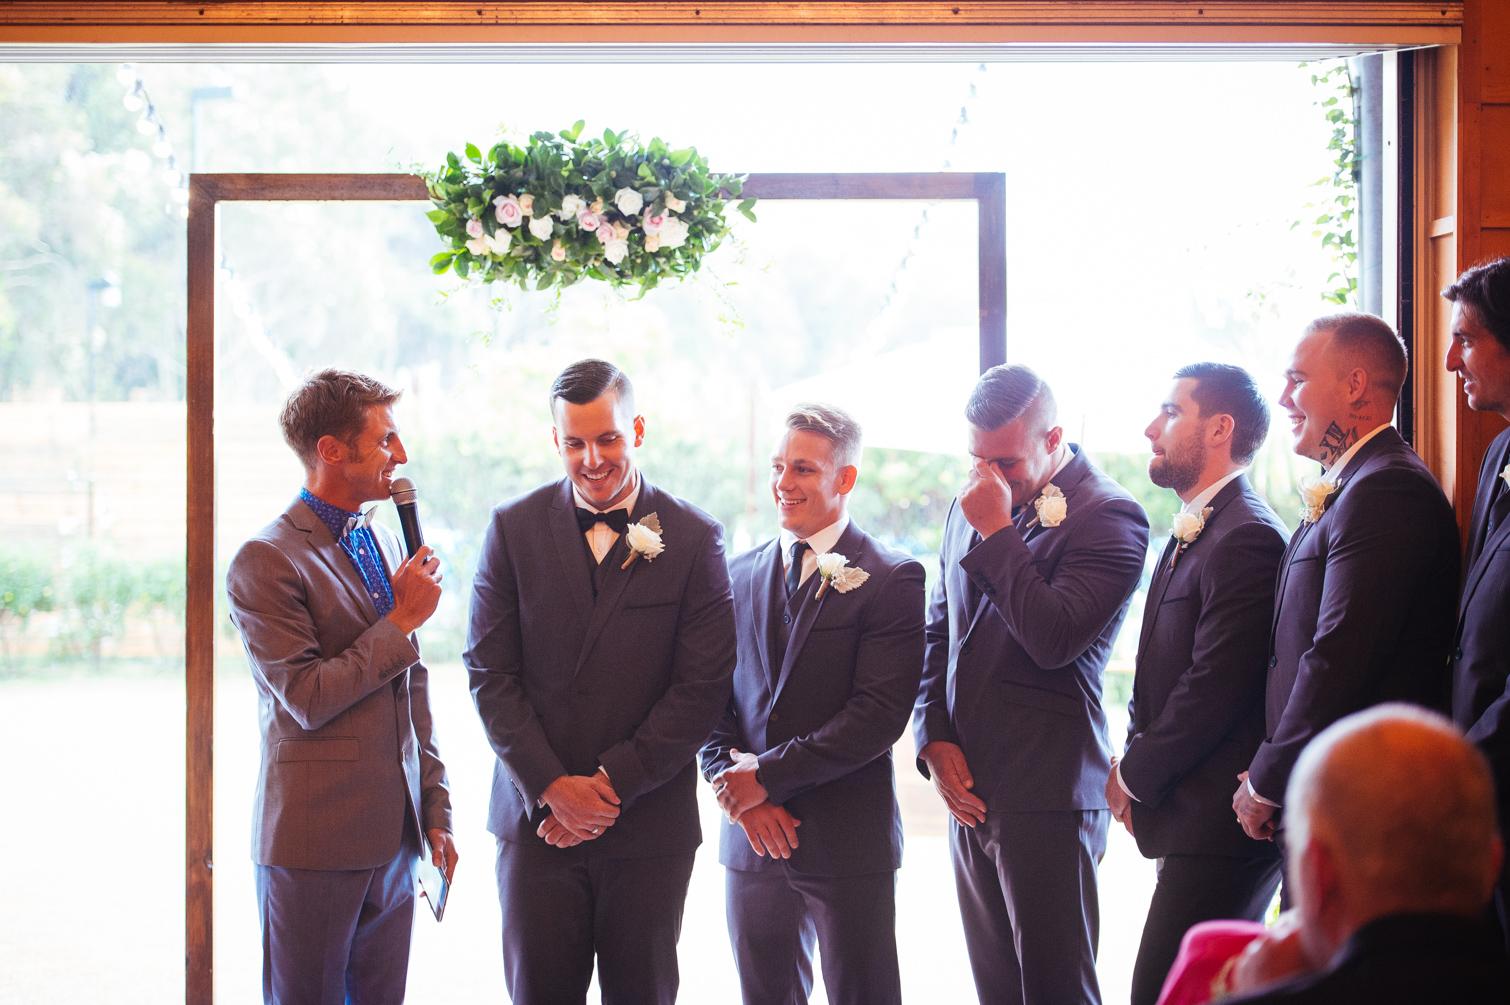 Kingscliffe_male_wedding_celebrant-Benjamin_Carlyle -3.jpg